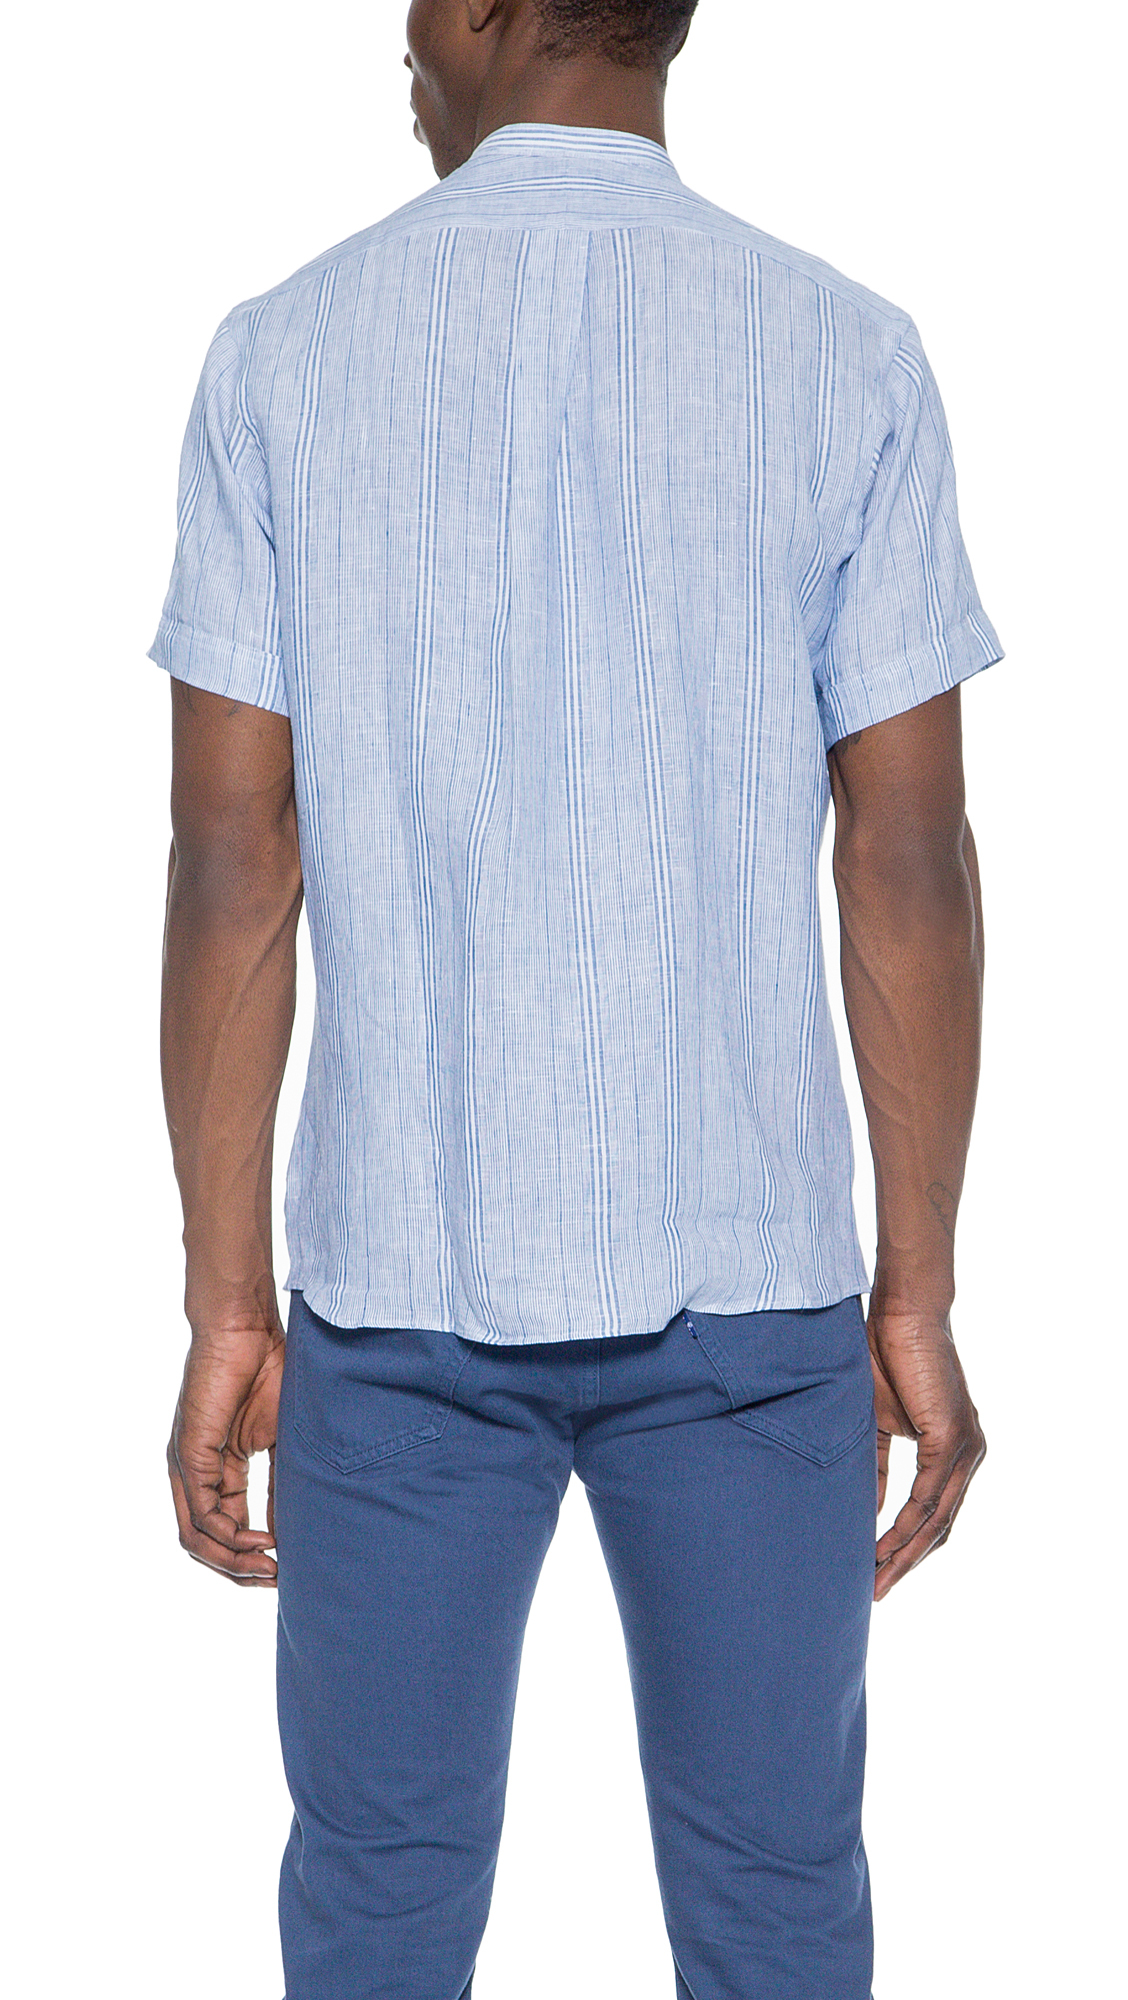 Hamilton 1883 Band Collar Linen Shirt In Blue For Men Lyst